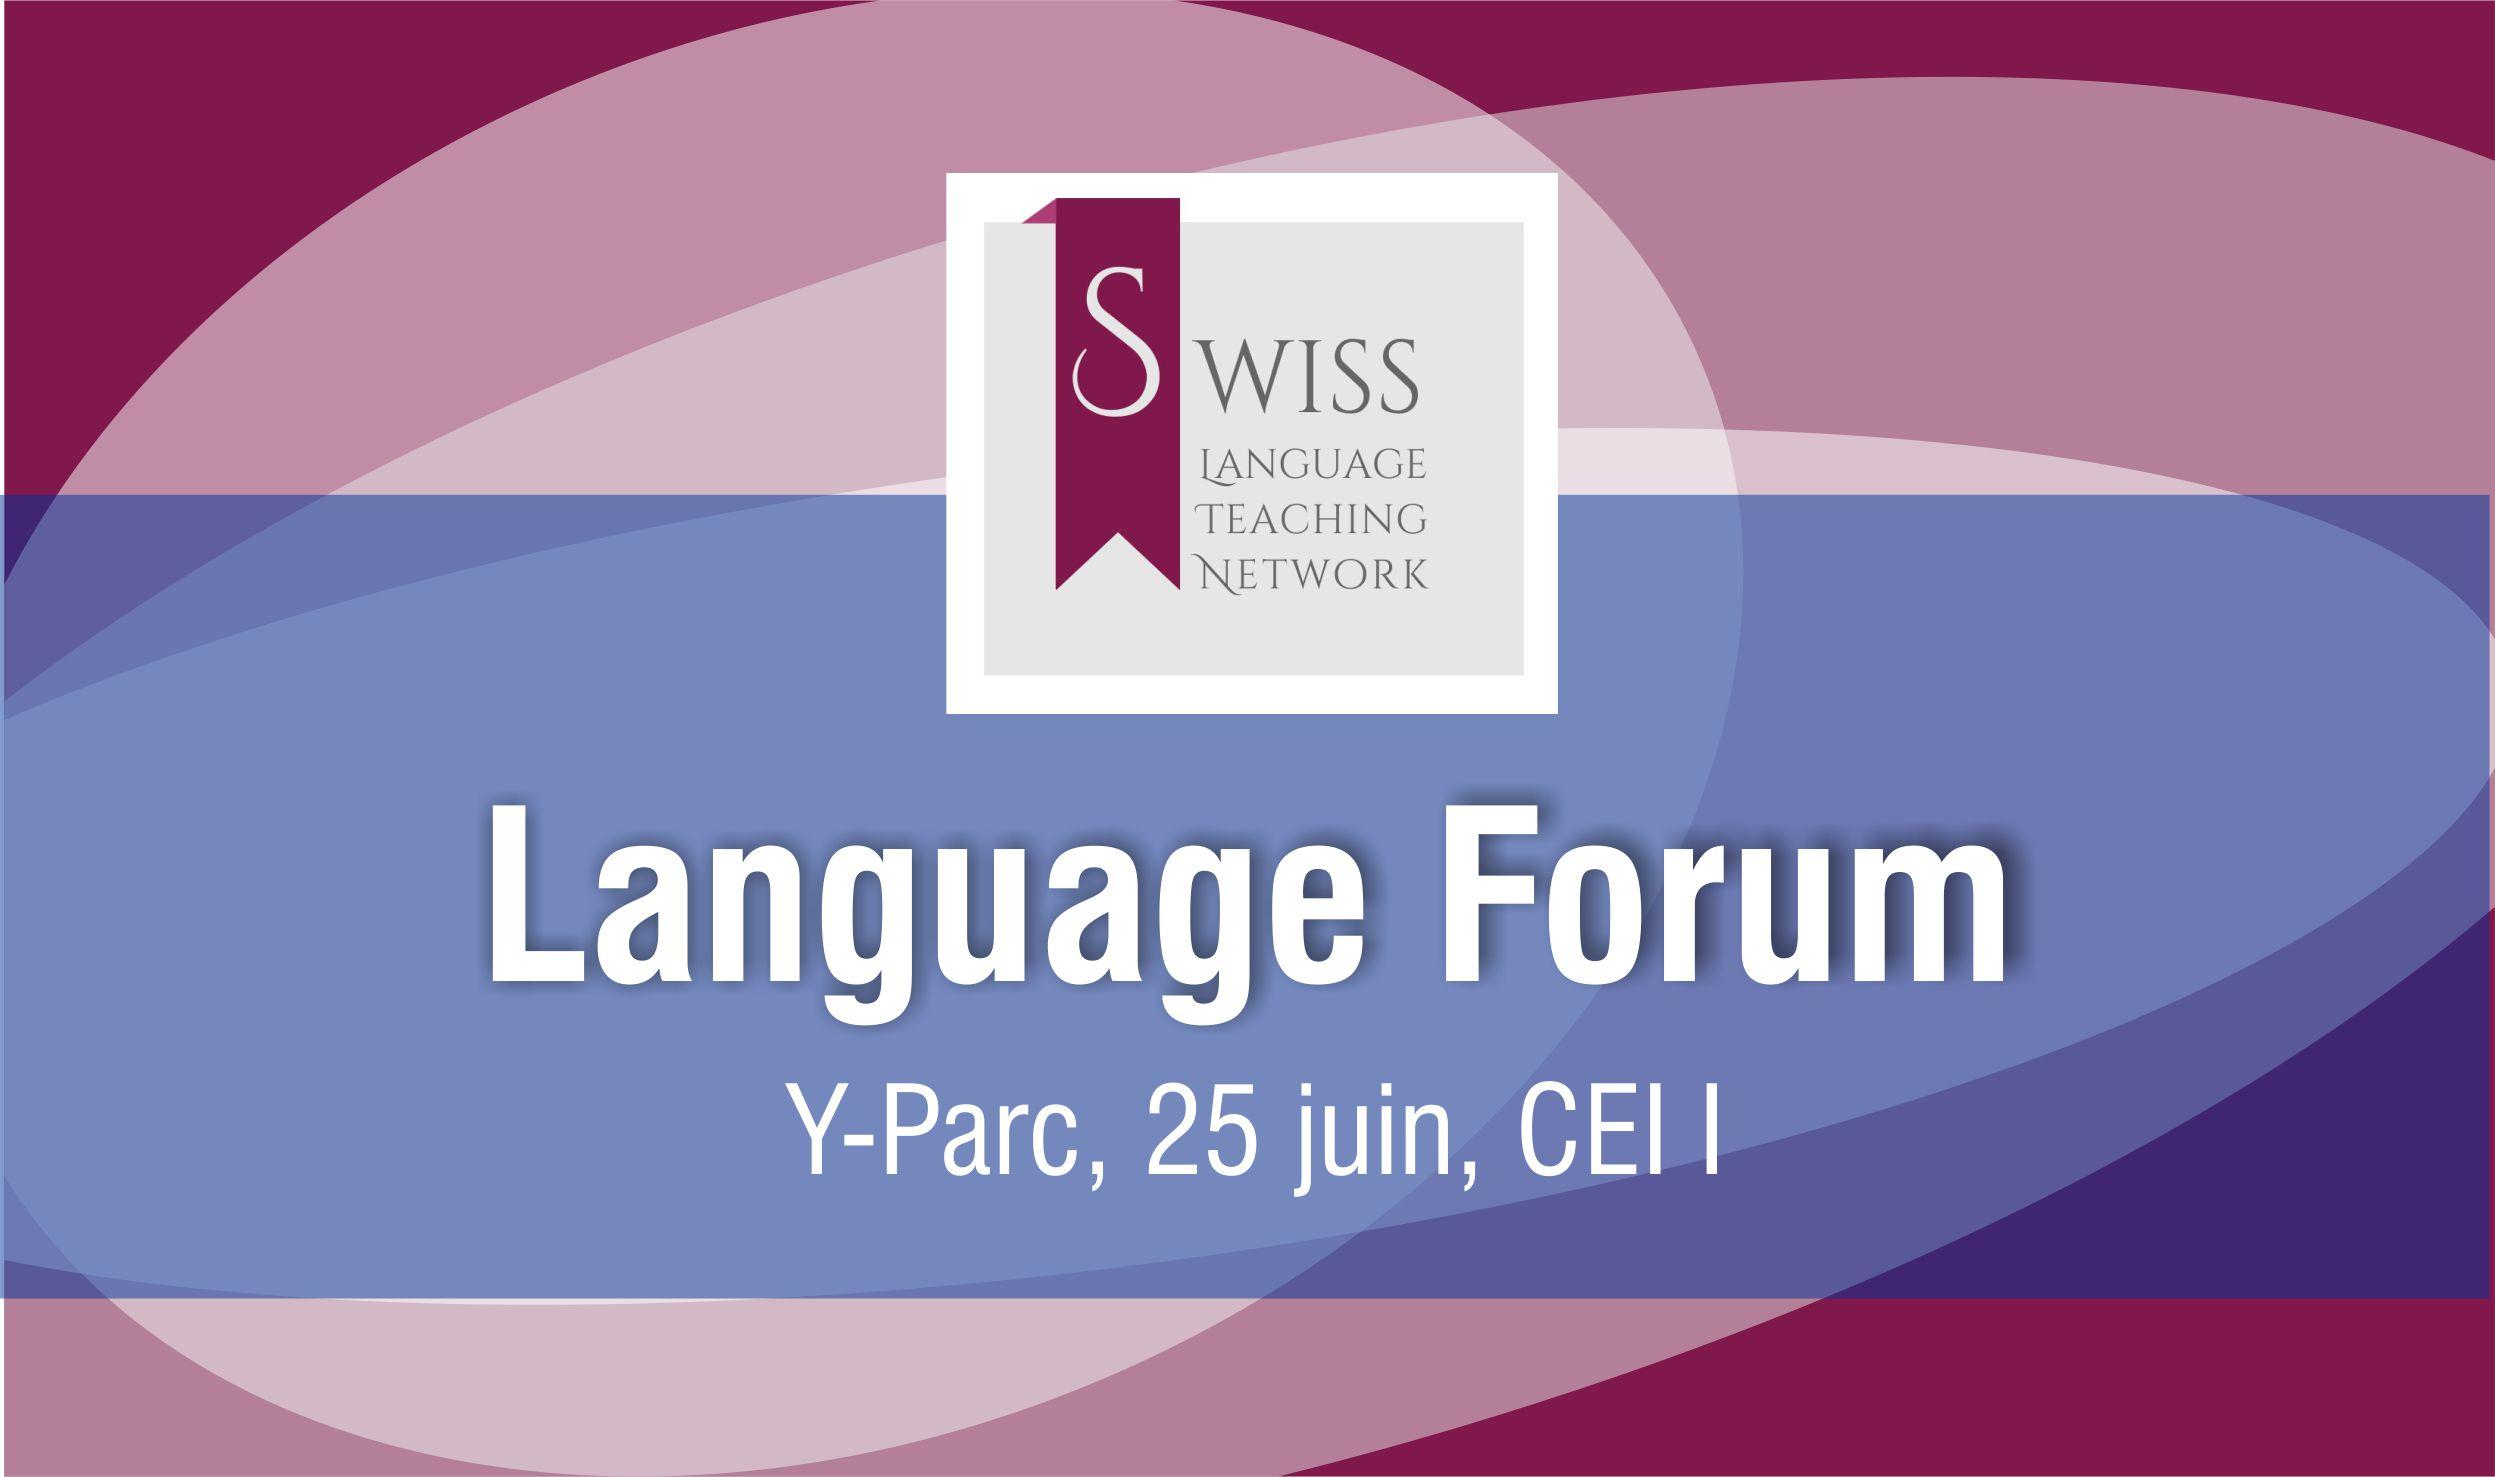 Language Forum Y-Parc